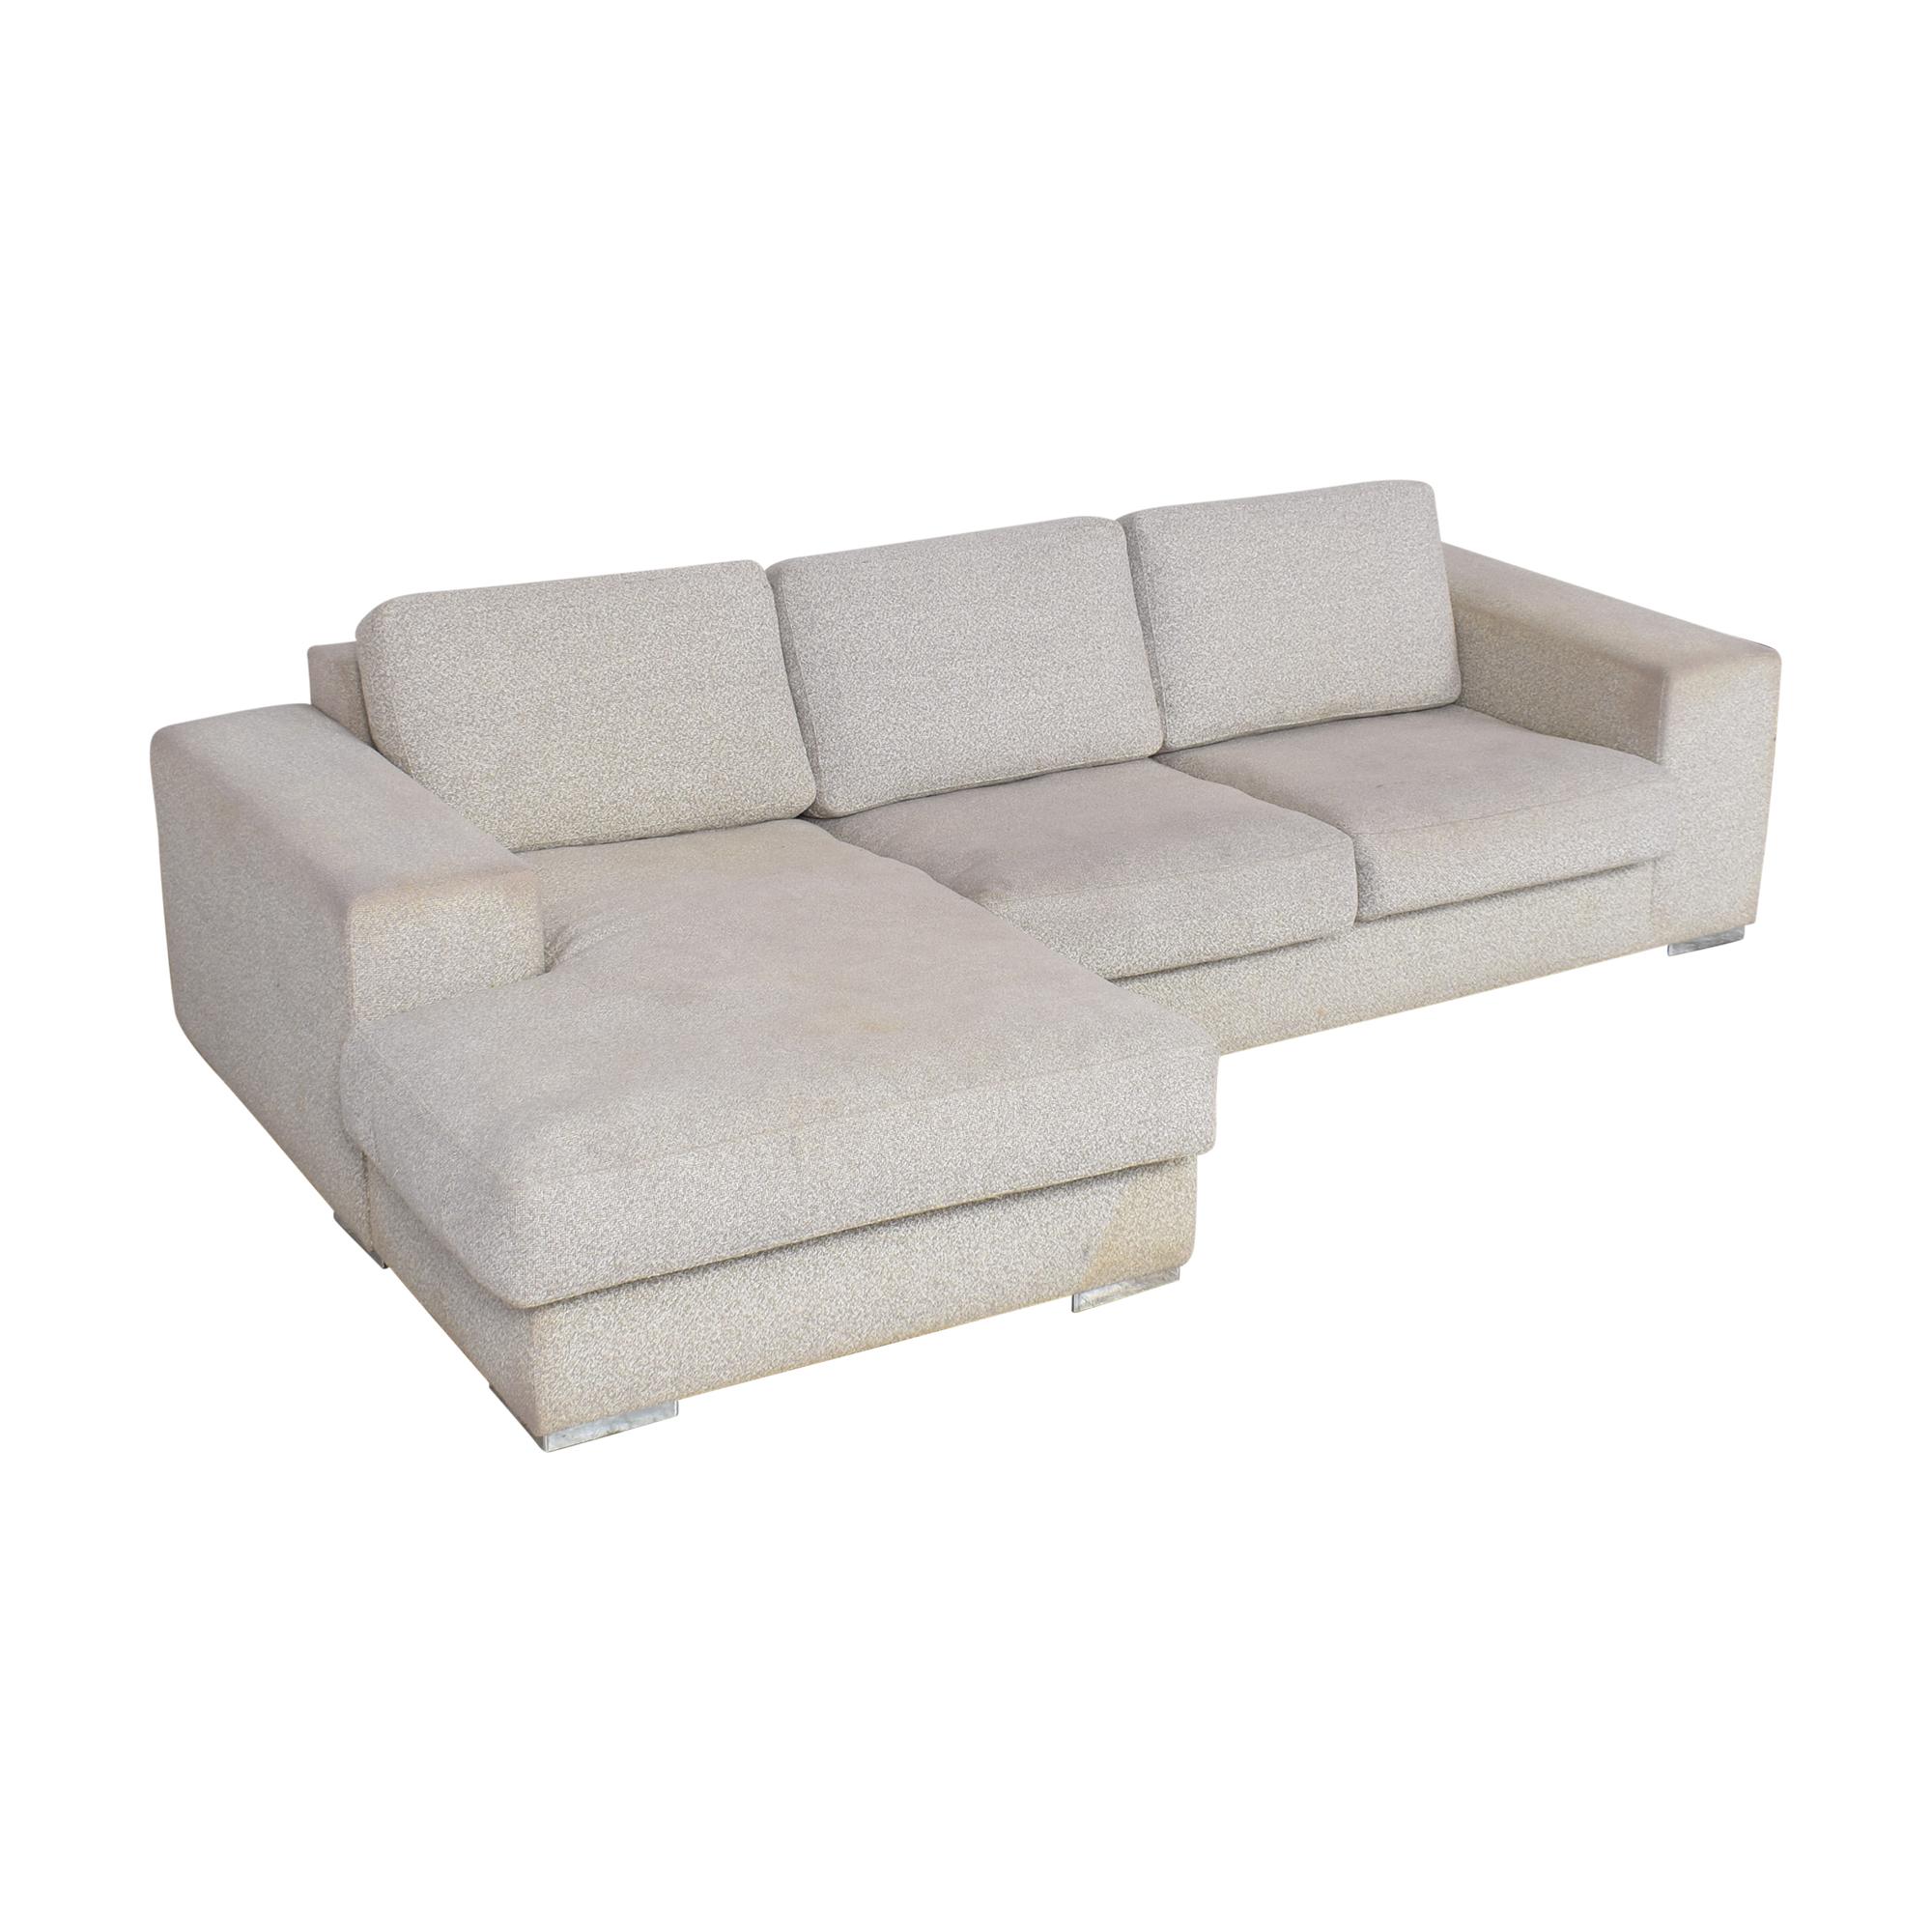 BoConcept BoConcept Chaise Sectional Sofa light gray